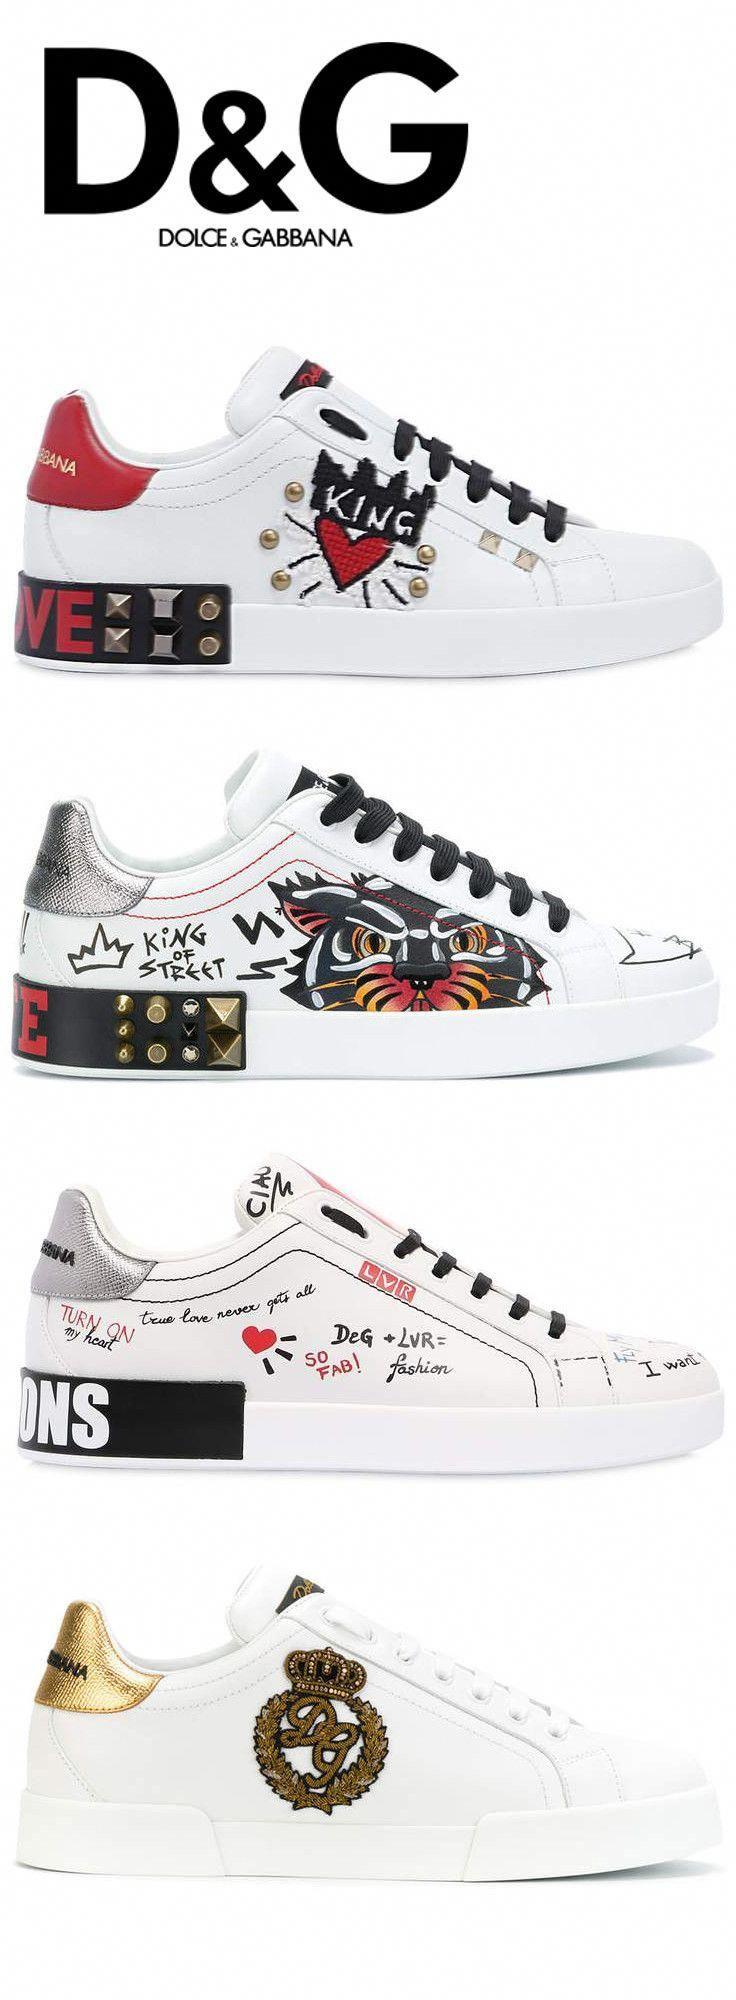 dolce & gabbana sneakers men